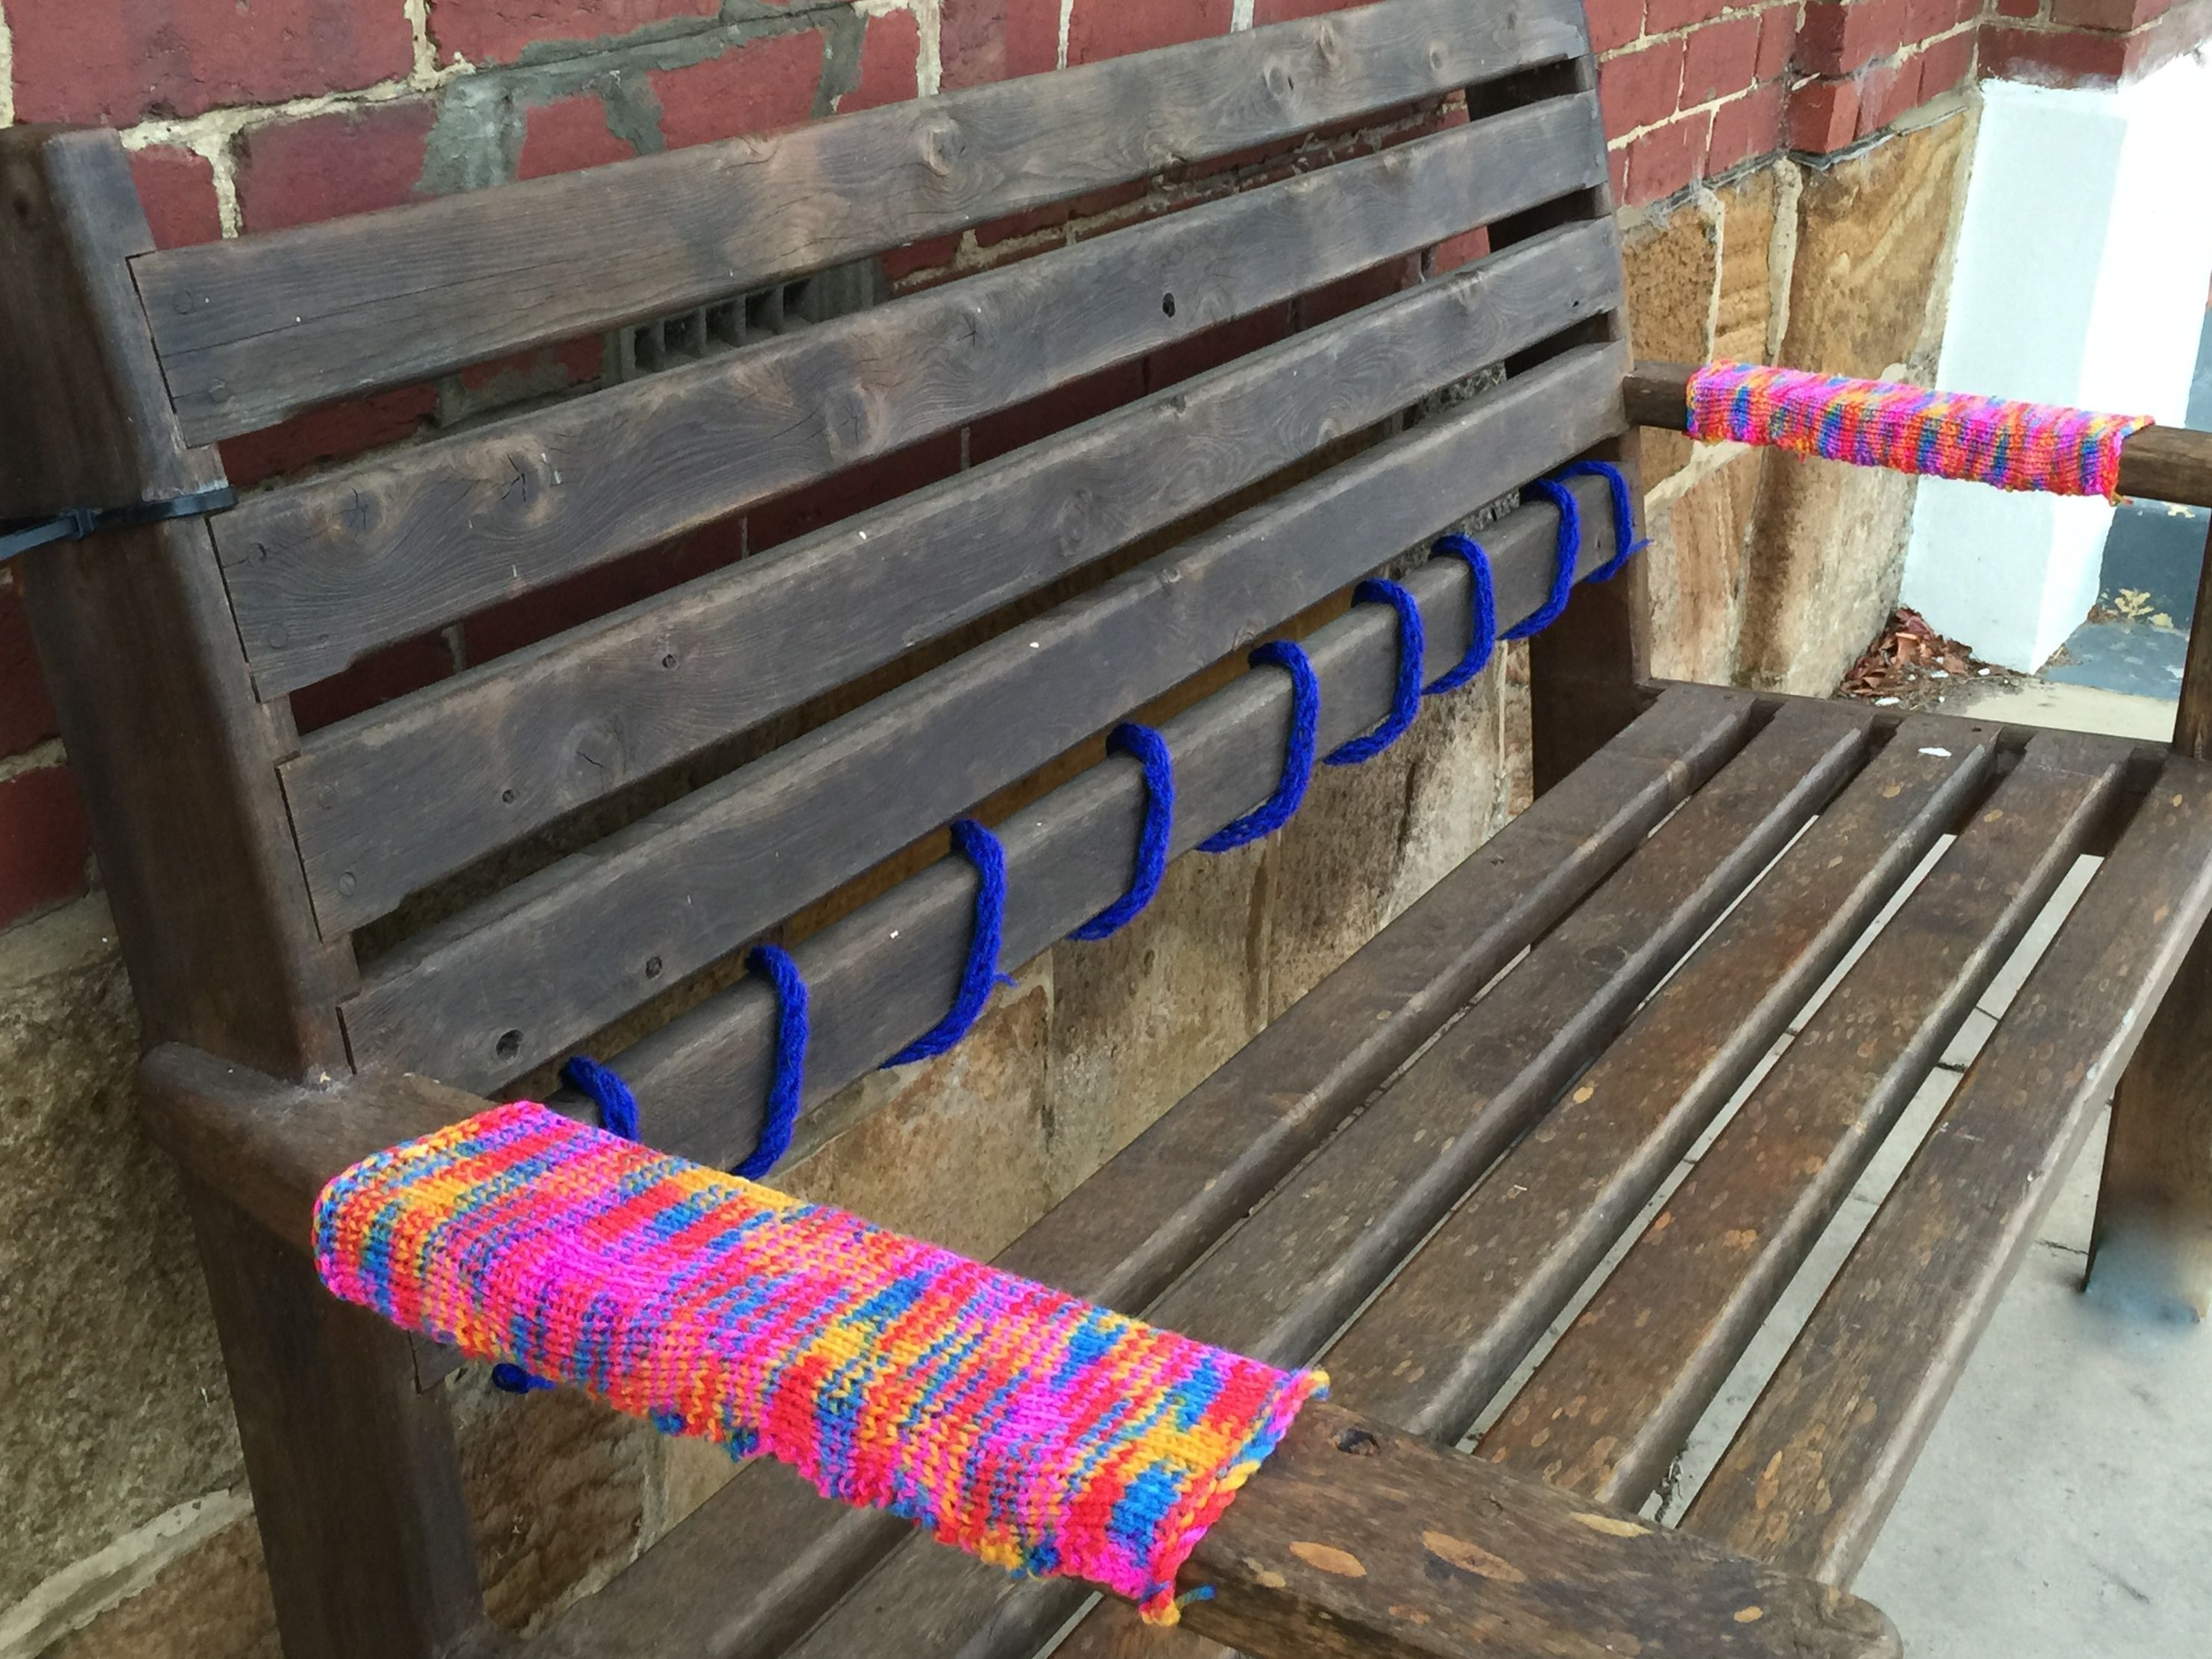 yarn bombing bench - photo #6